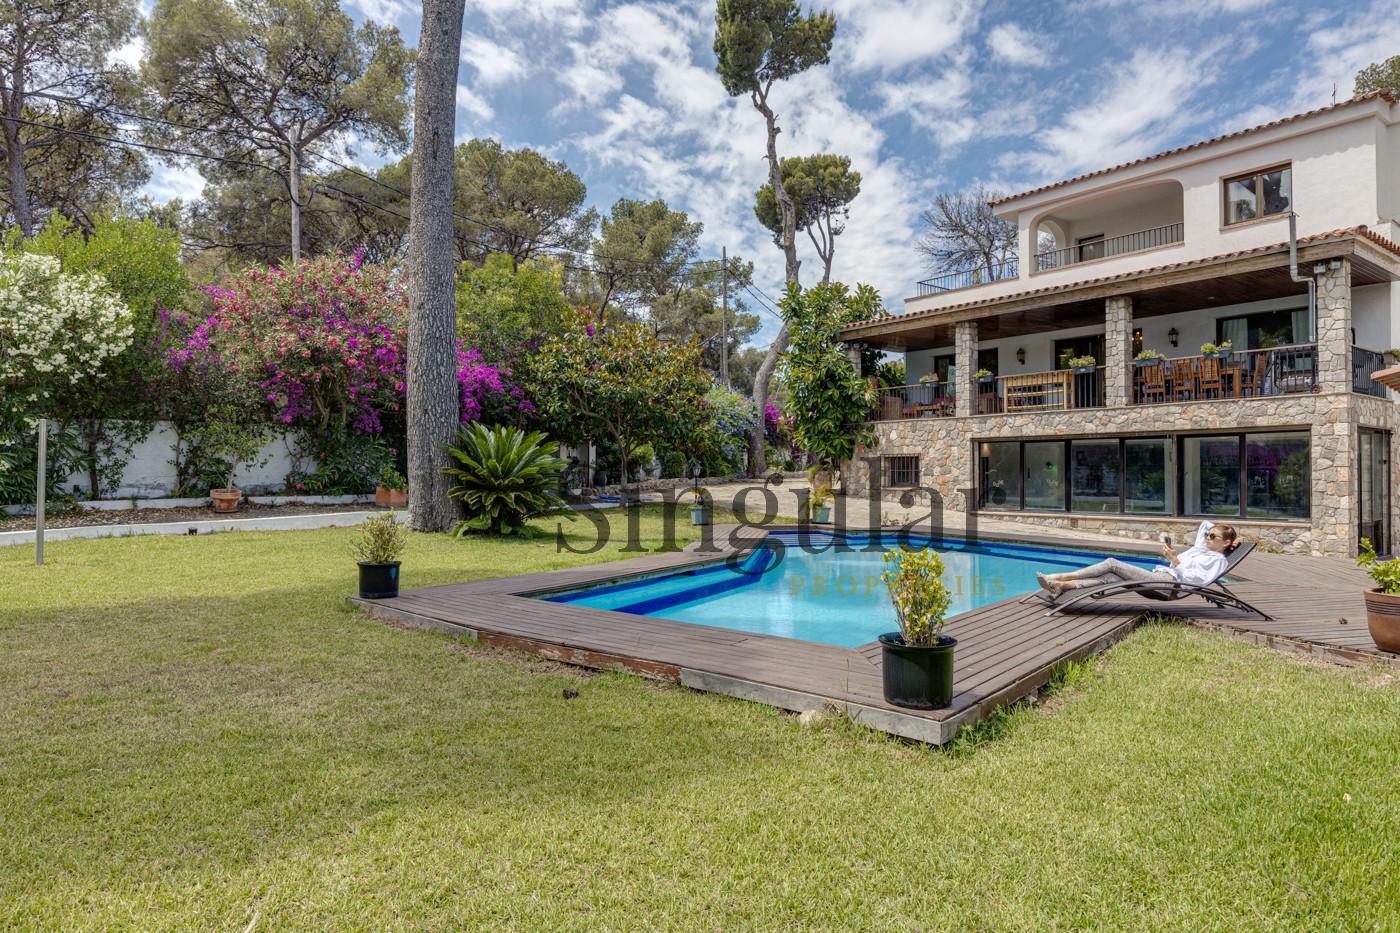 "<a href=""https://singularproperties.es/es/listing/impresionante-rodeada-vegetacion-piscina/"" target="""">Impresionante rodeada de vegetación y piscina</a>"